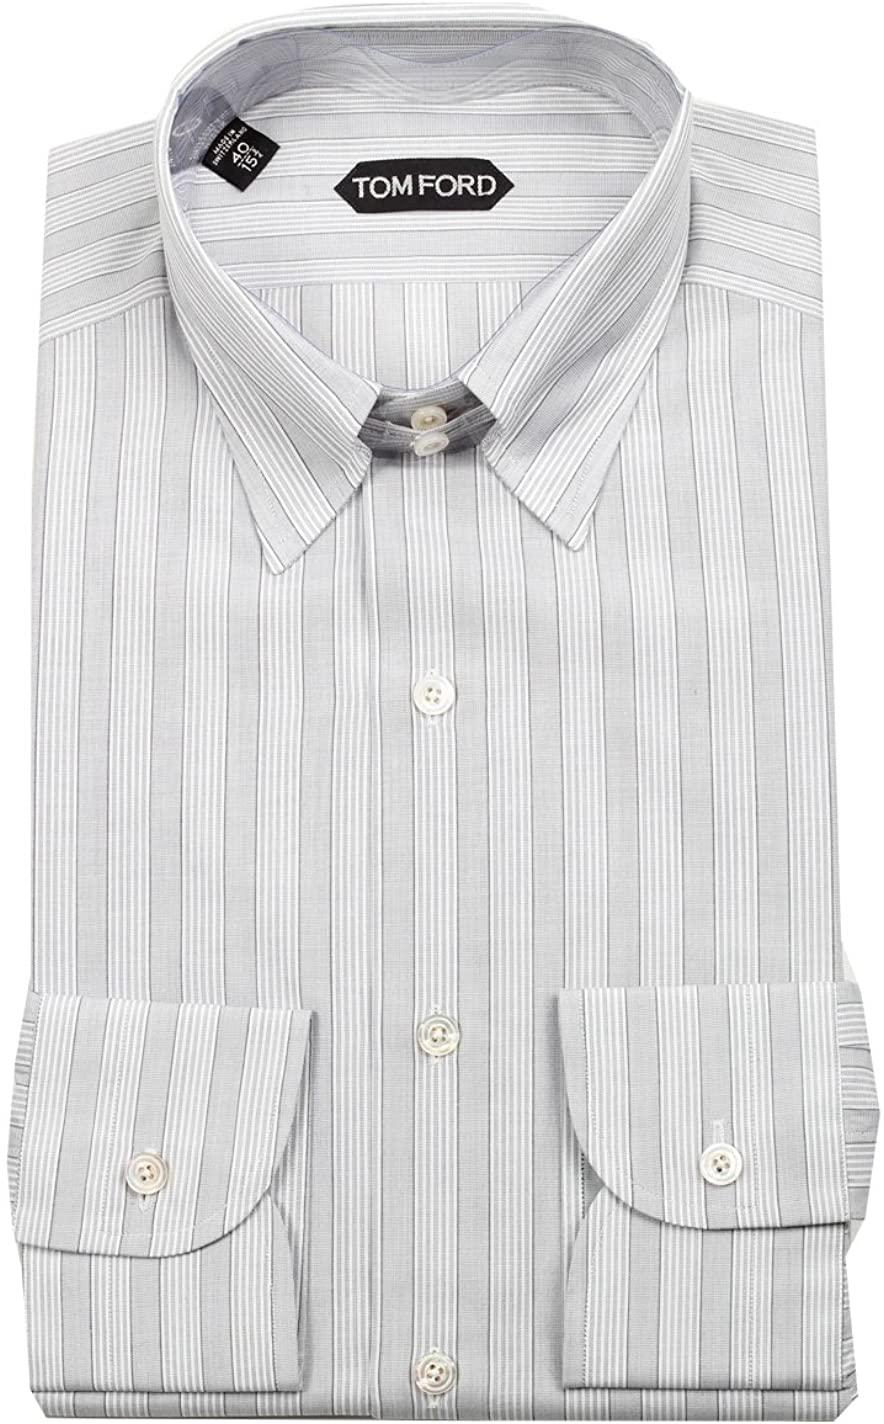 CL - Tom Ford Striped Gray High Collar Dress Shirt Size 40/15,75 U.S.